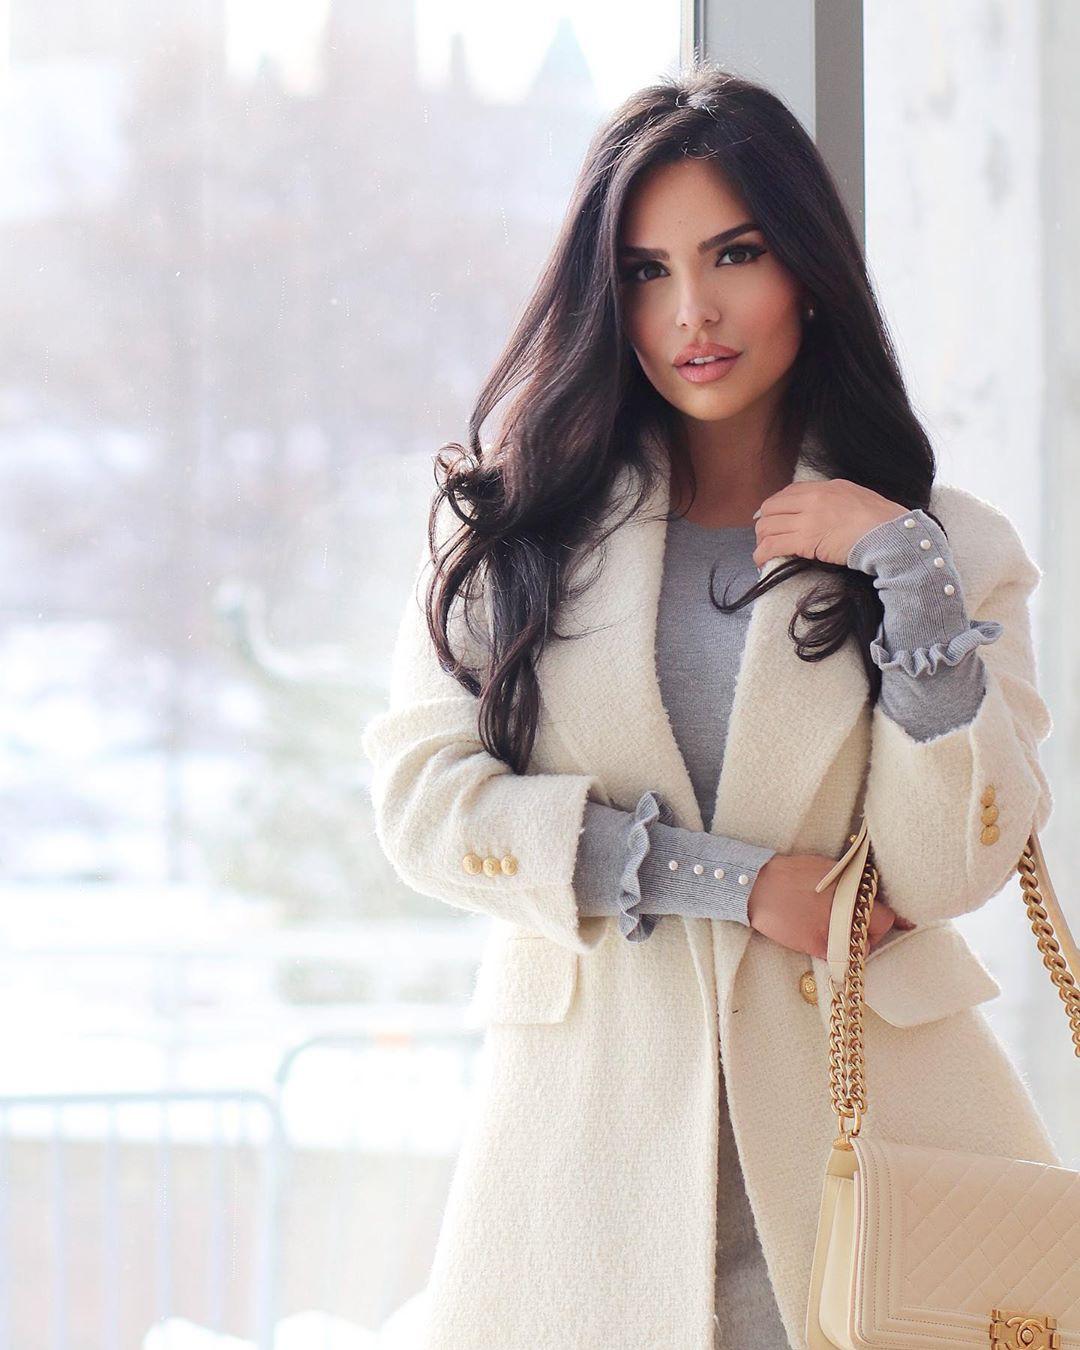 Shadi Y Cair instagram photoshoot, model photography, fashion tips